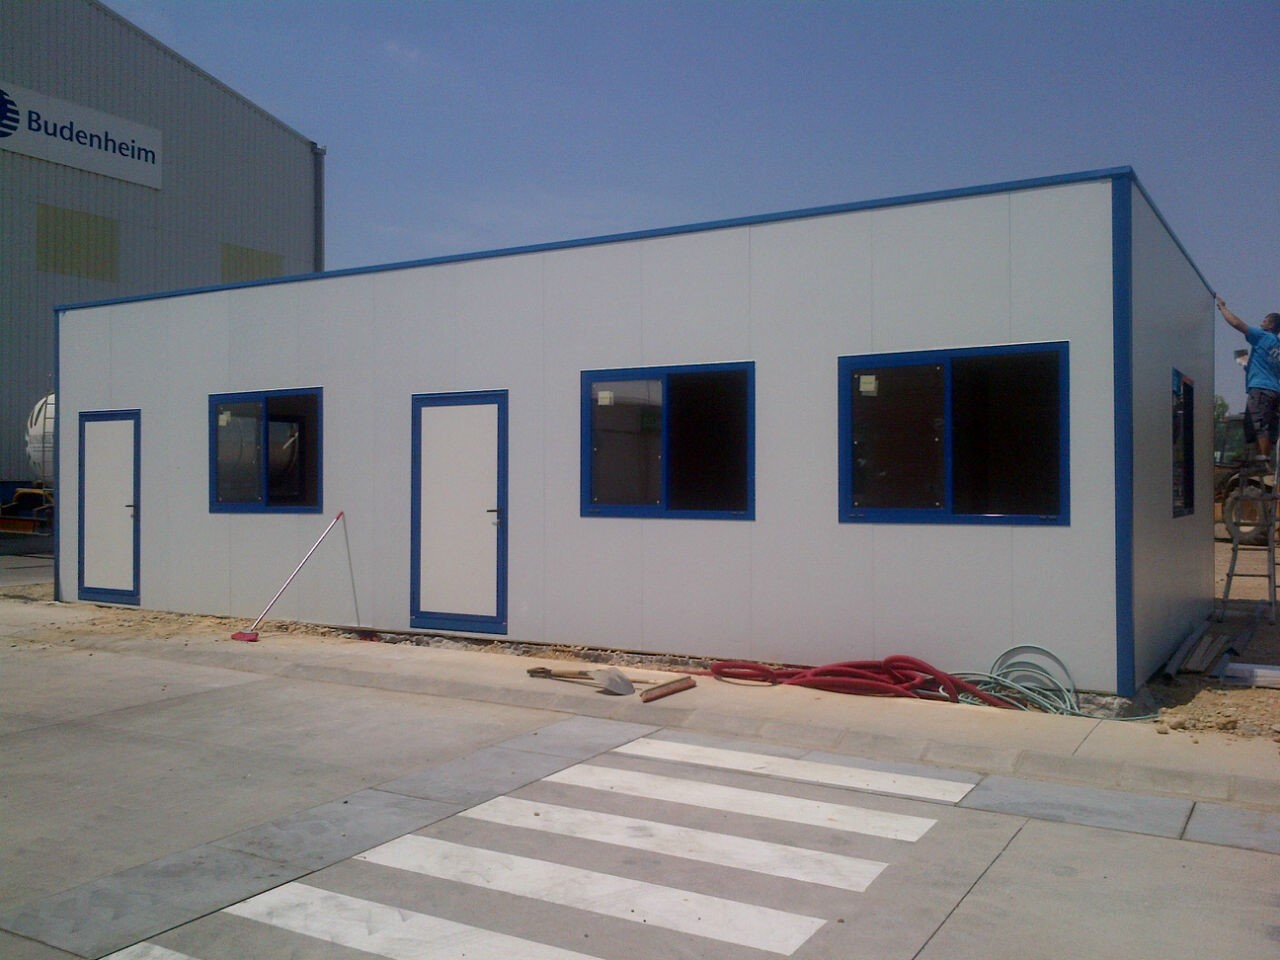 Construccion modular prefabricada especial prefabri for Construccion modular prefabricada